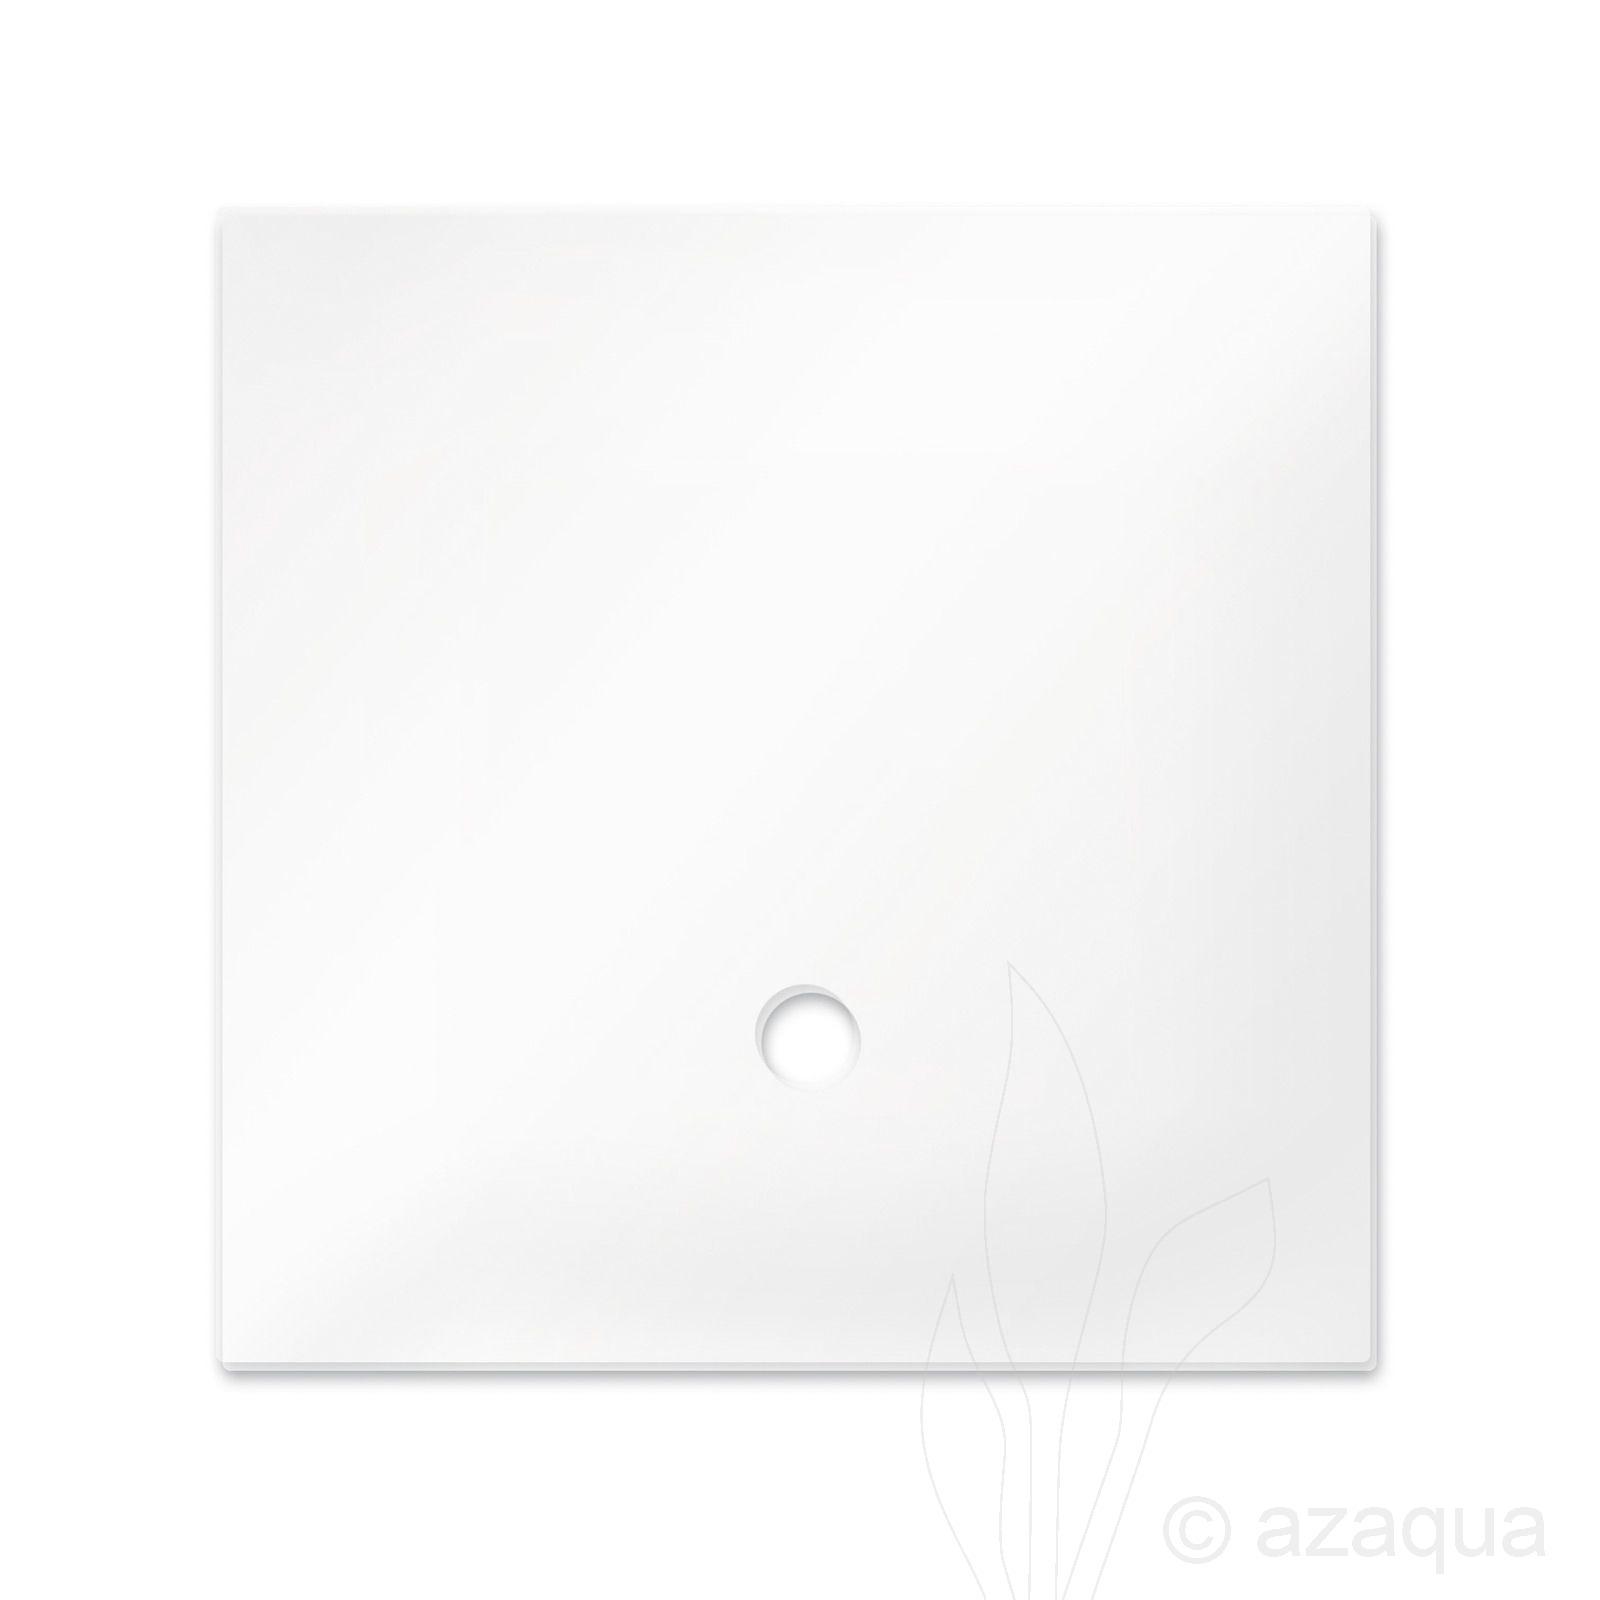 Dennerle cover pane NanoCube 10L